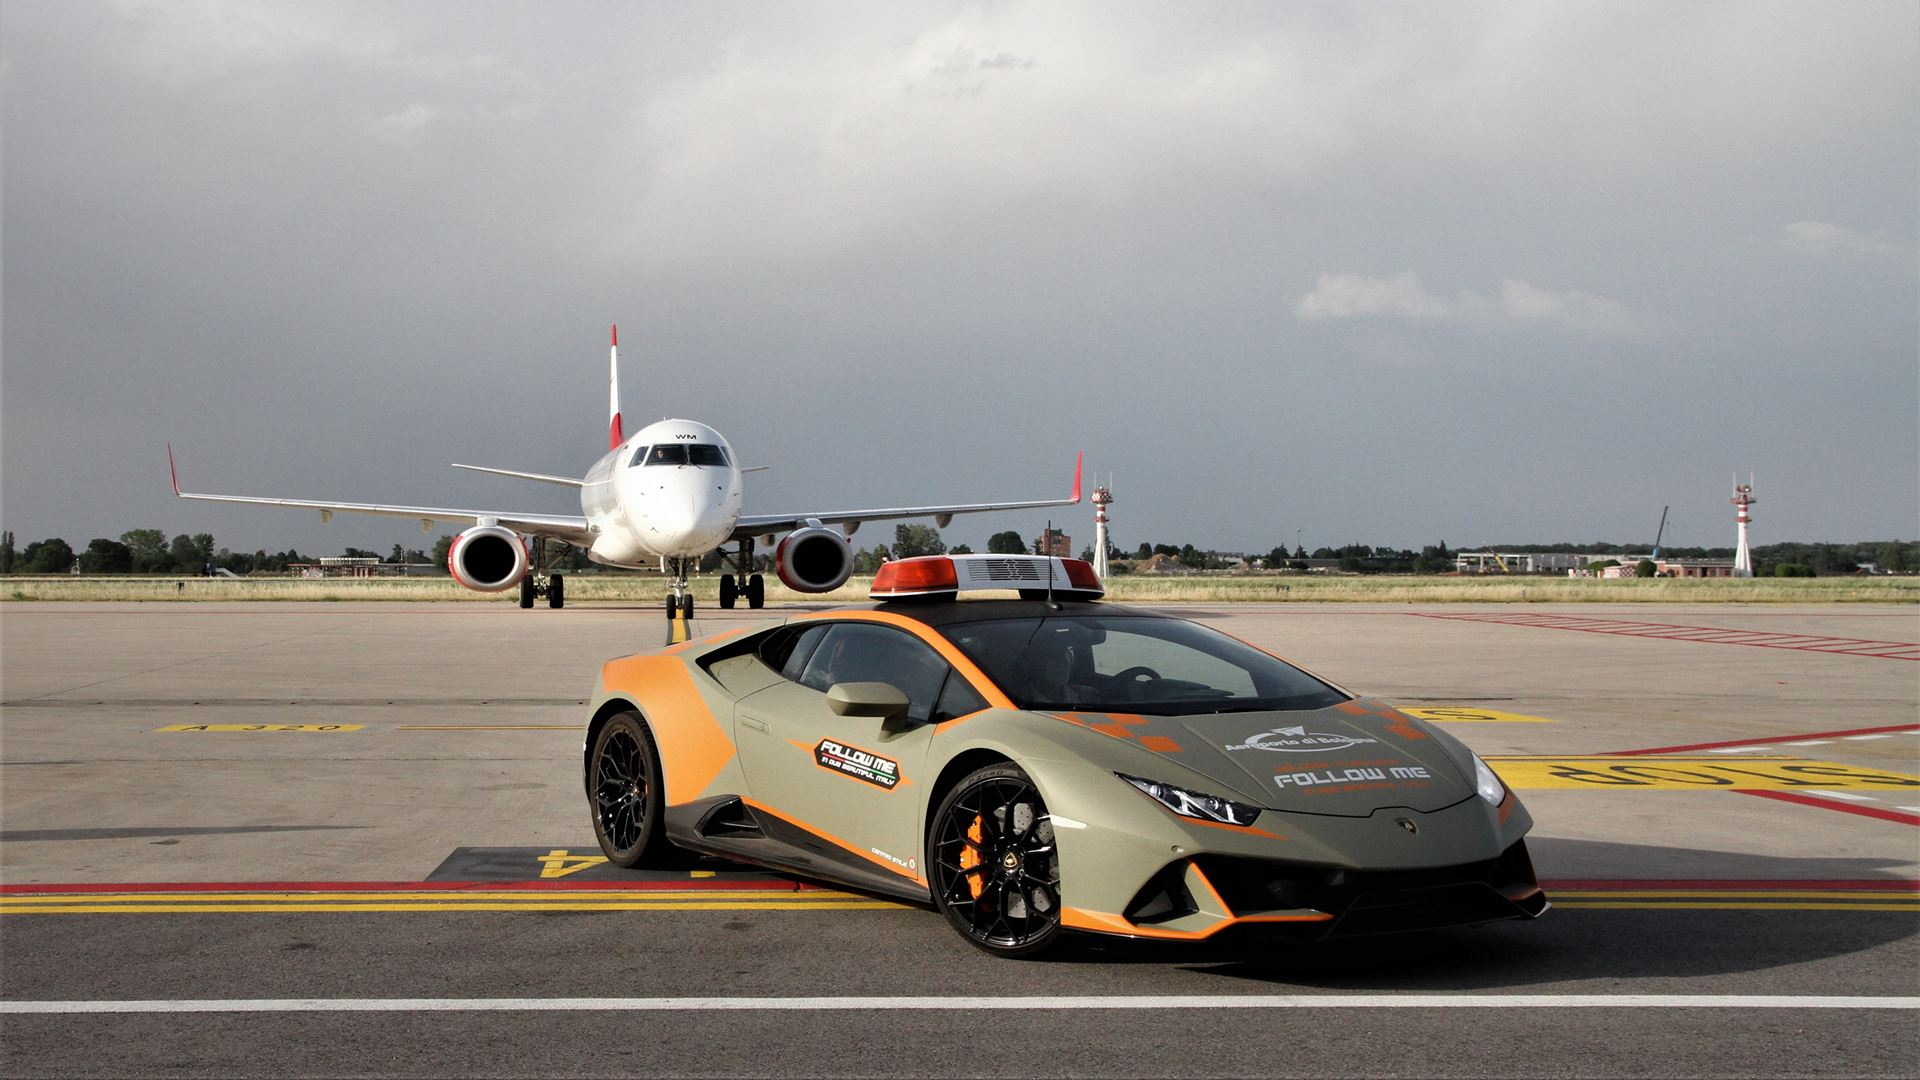 A new Lamborghini Huracán EVO follow-me car for Bologna Airport - Image 4